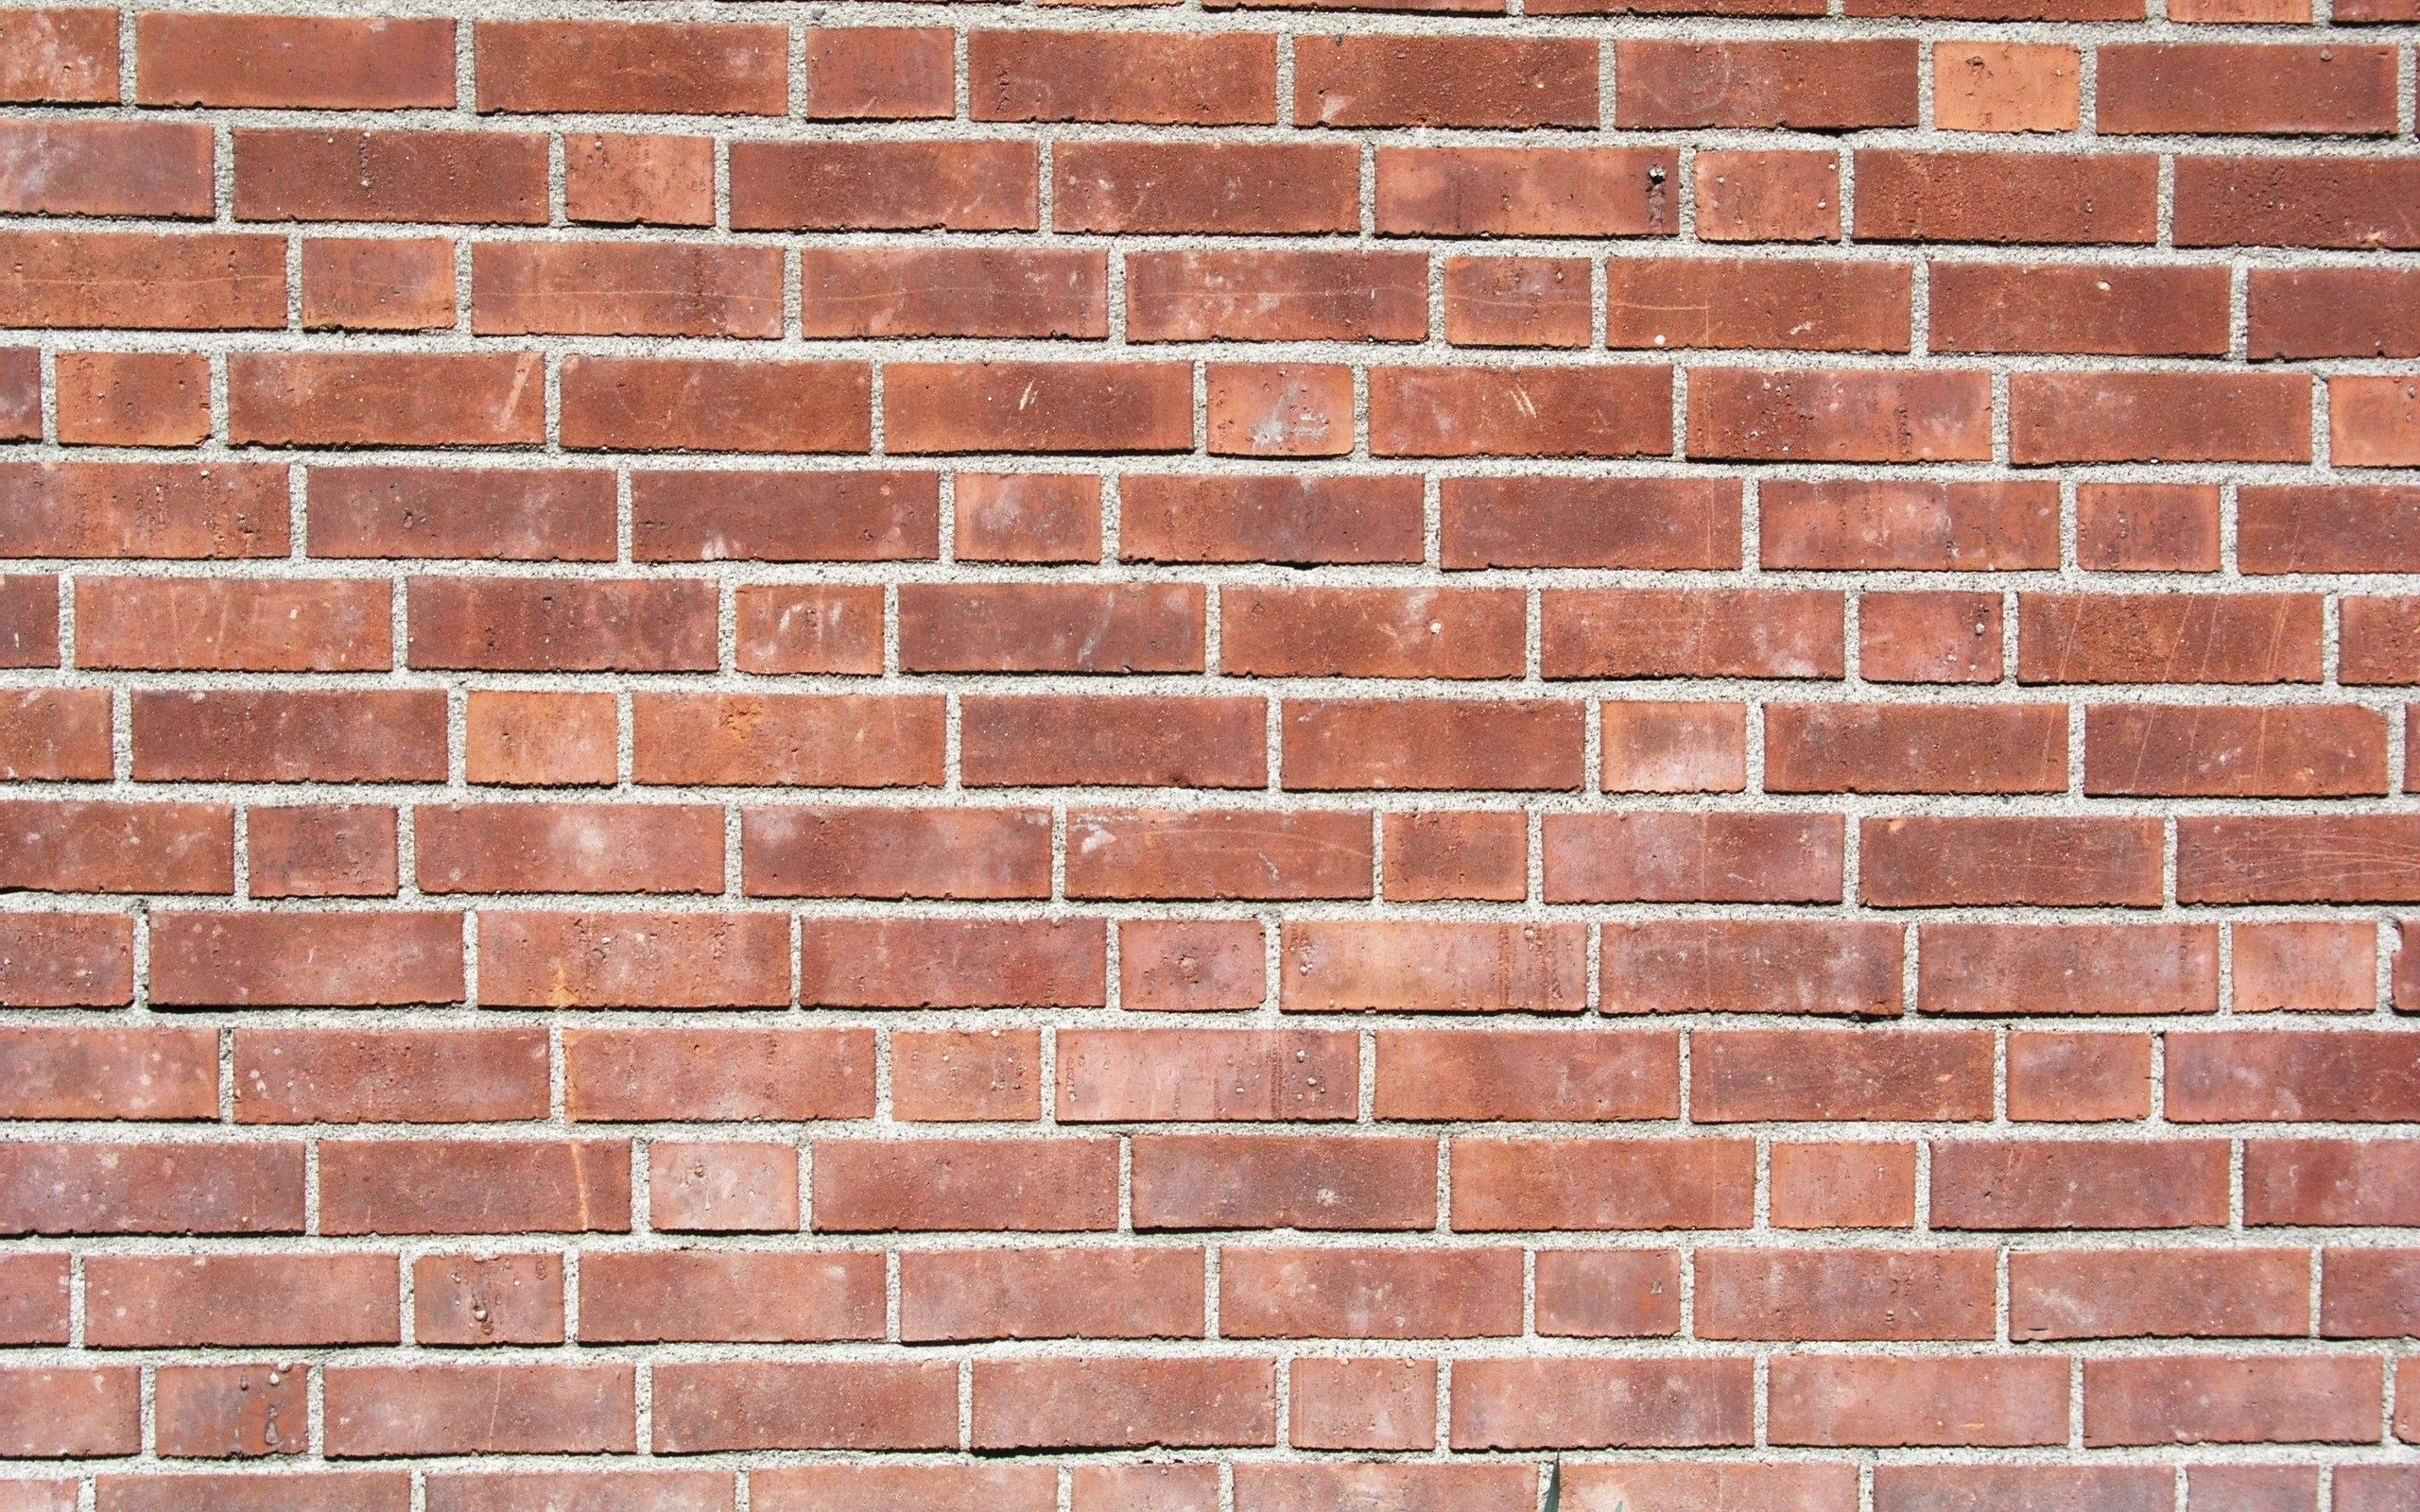 Brick Image Wall Pic Brick Pattern Wallpaper Brick Patterns Brick Wall Wallpaper